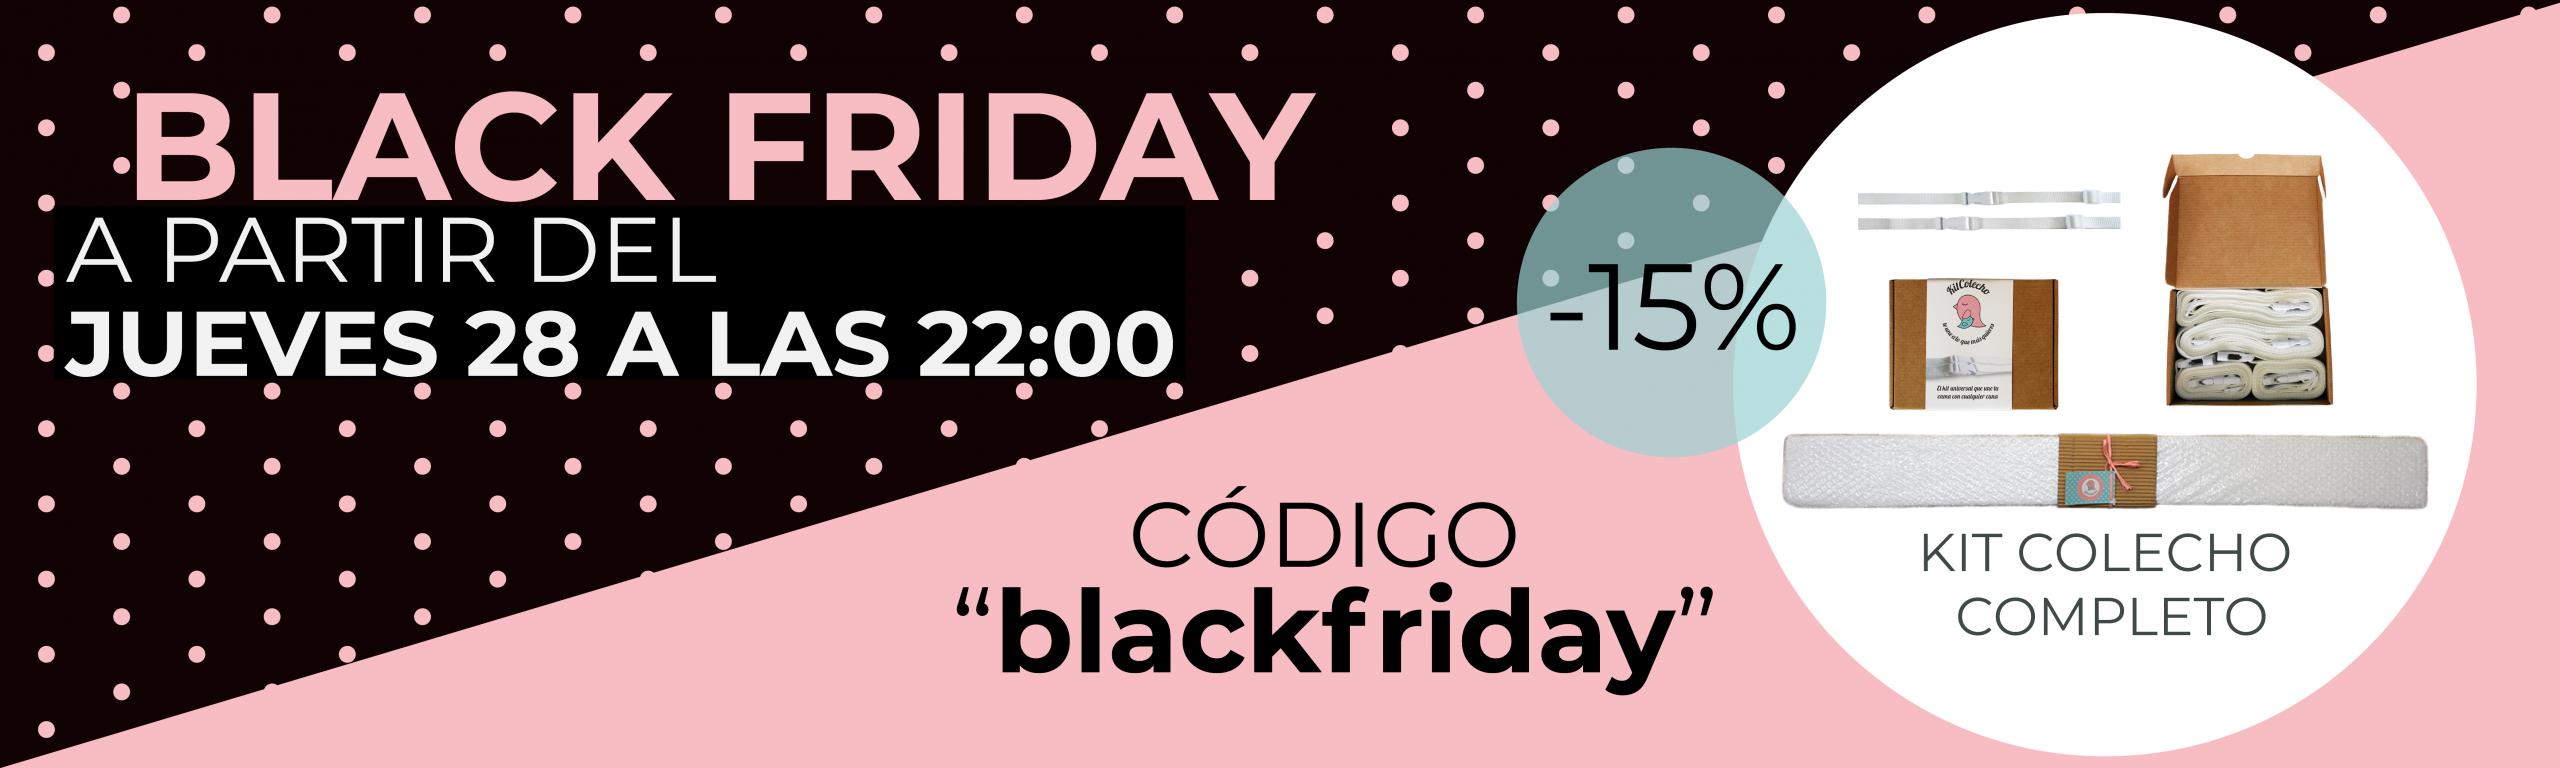 black friday kit colecho